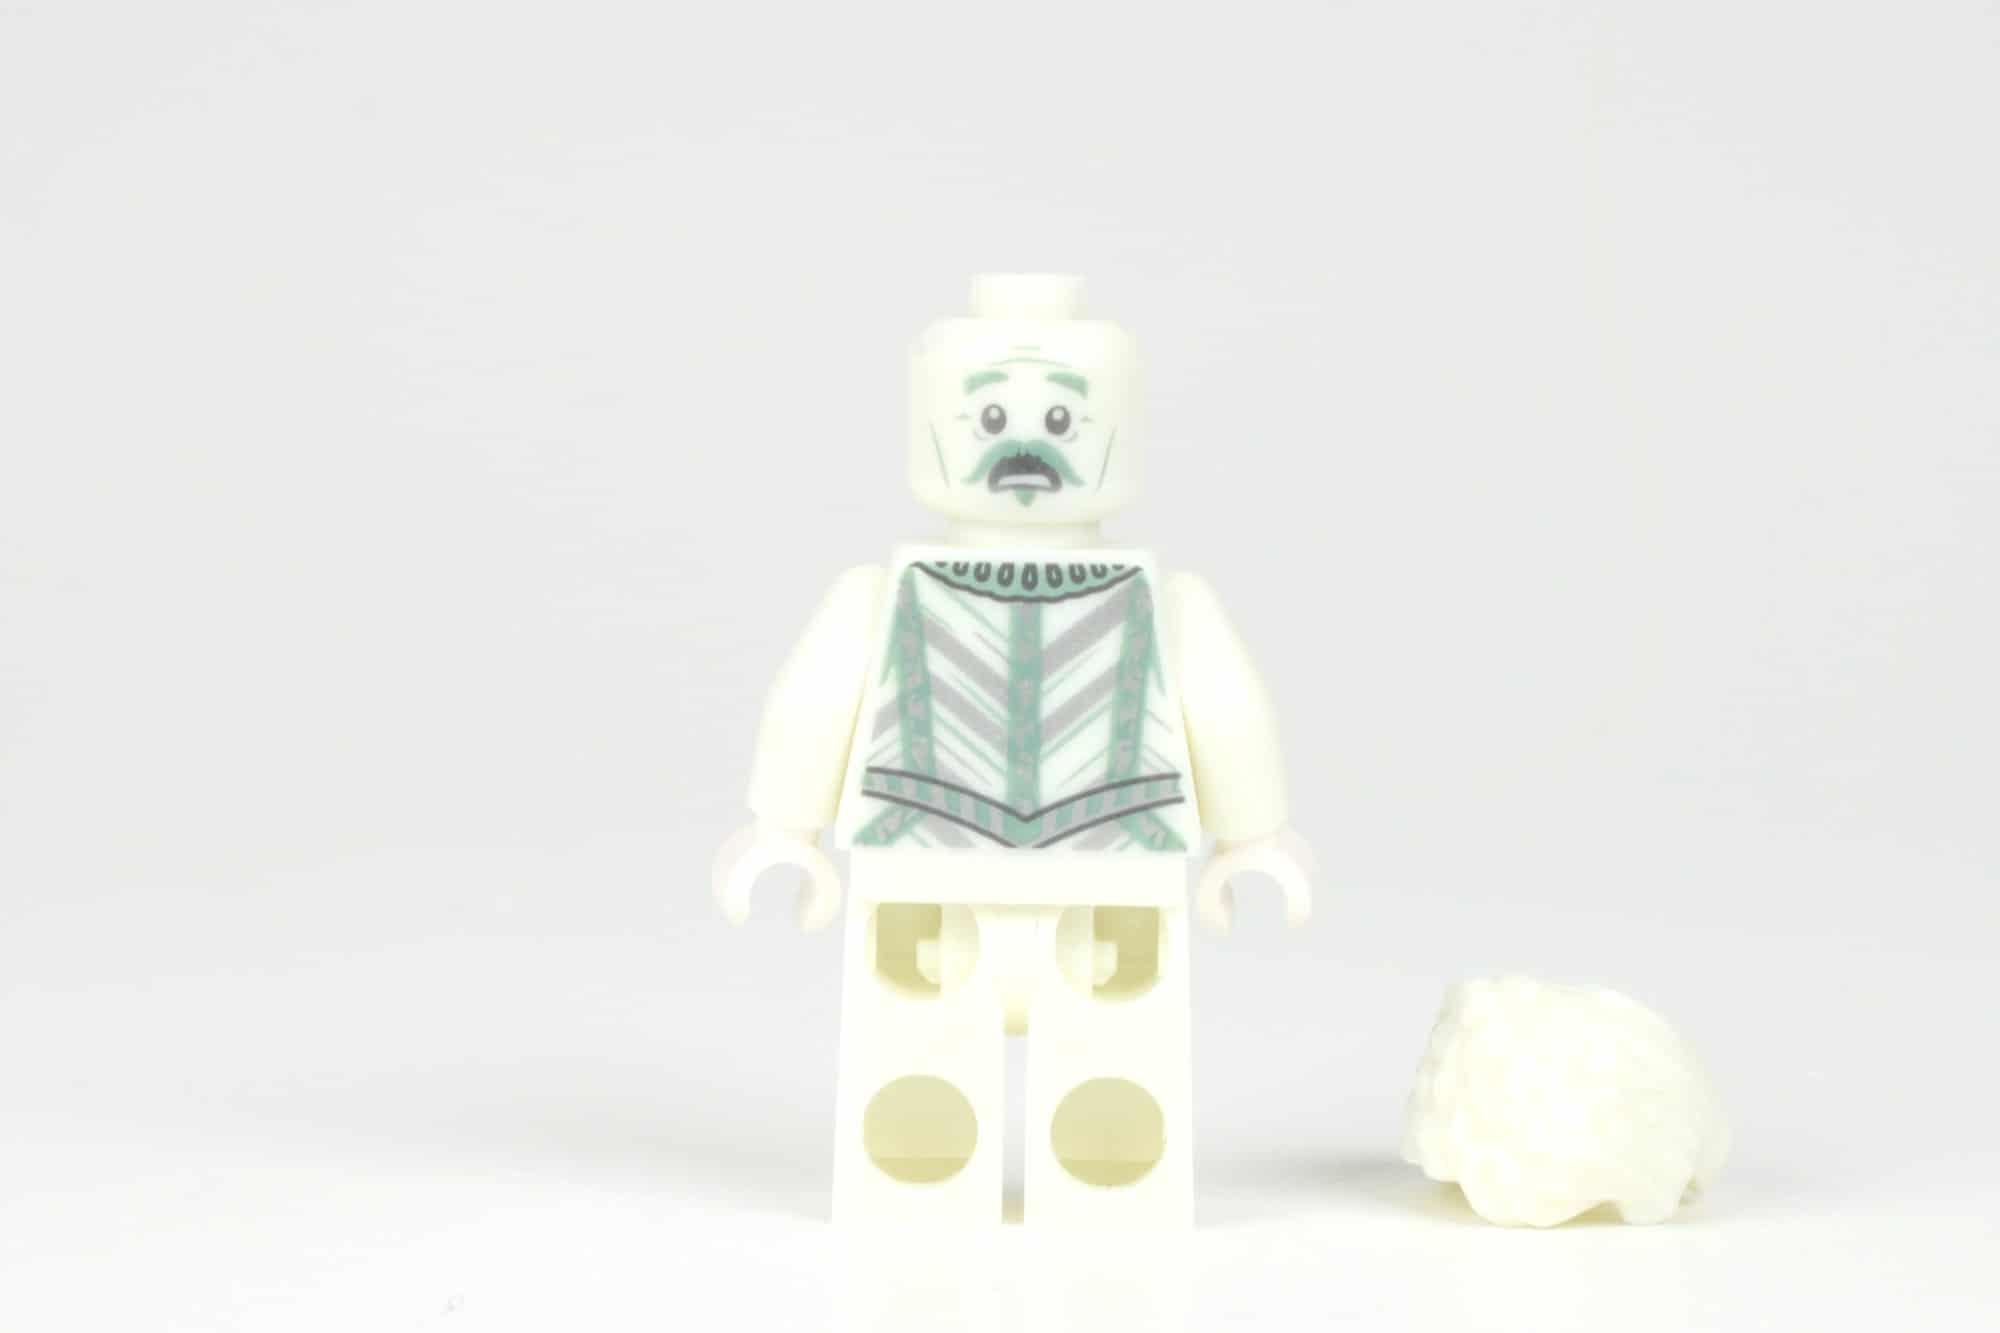 LEGO Harry Potter 76389 Hogwarts Kammer Des Schreckens Minifiguren 4 2